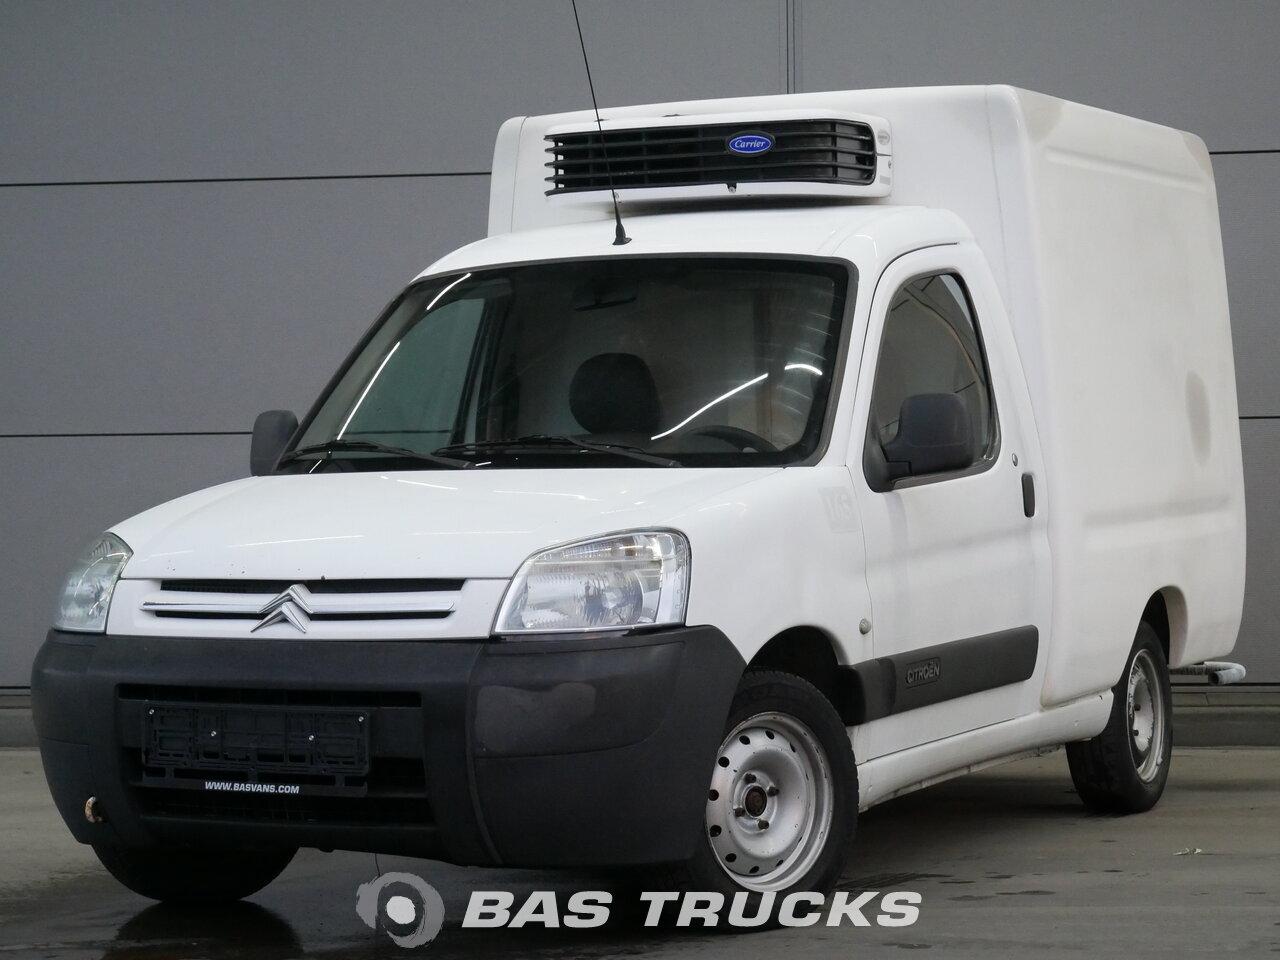 citro n berlingo light commercial vehicle u20ac3400 bas vans rh basvans com Operators Manual User Manual PDF